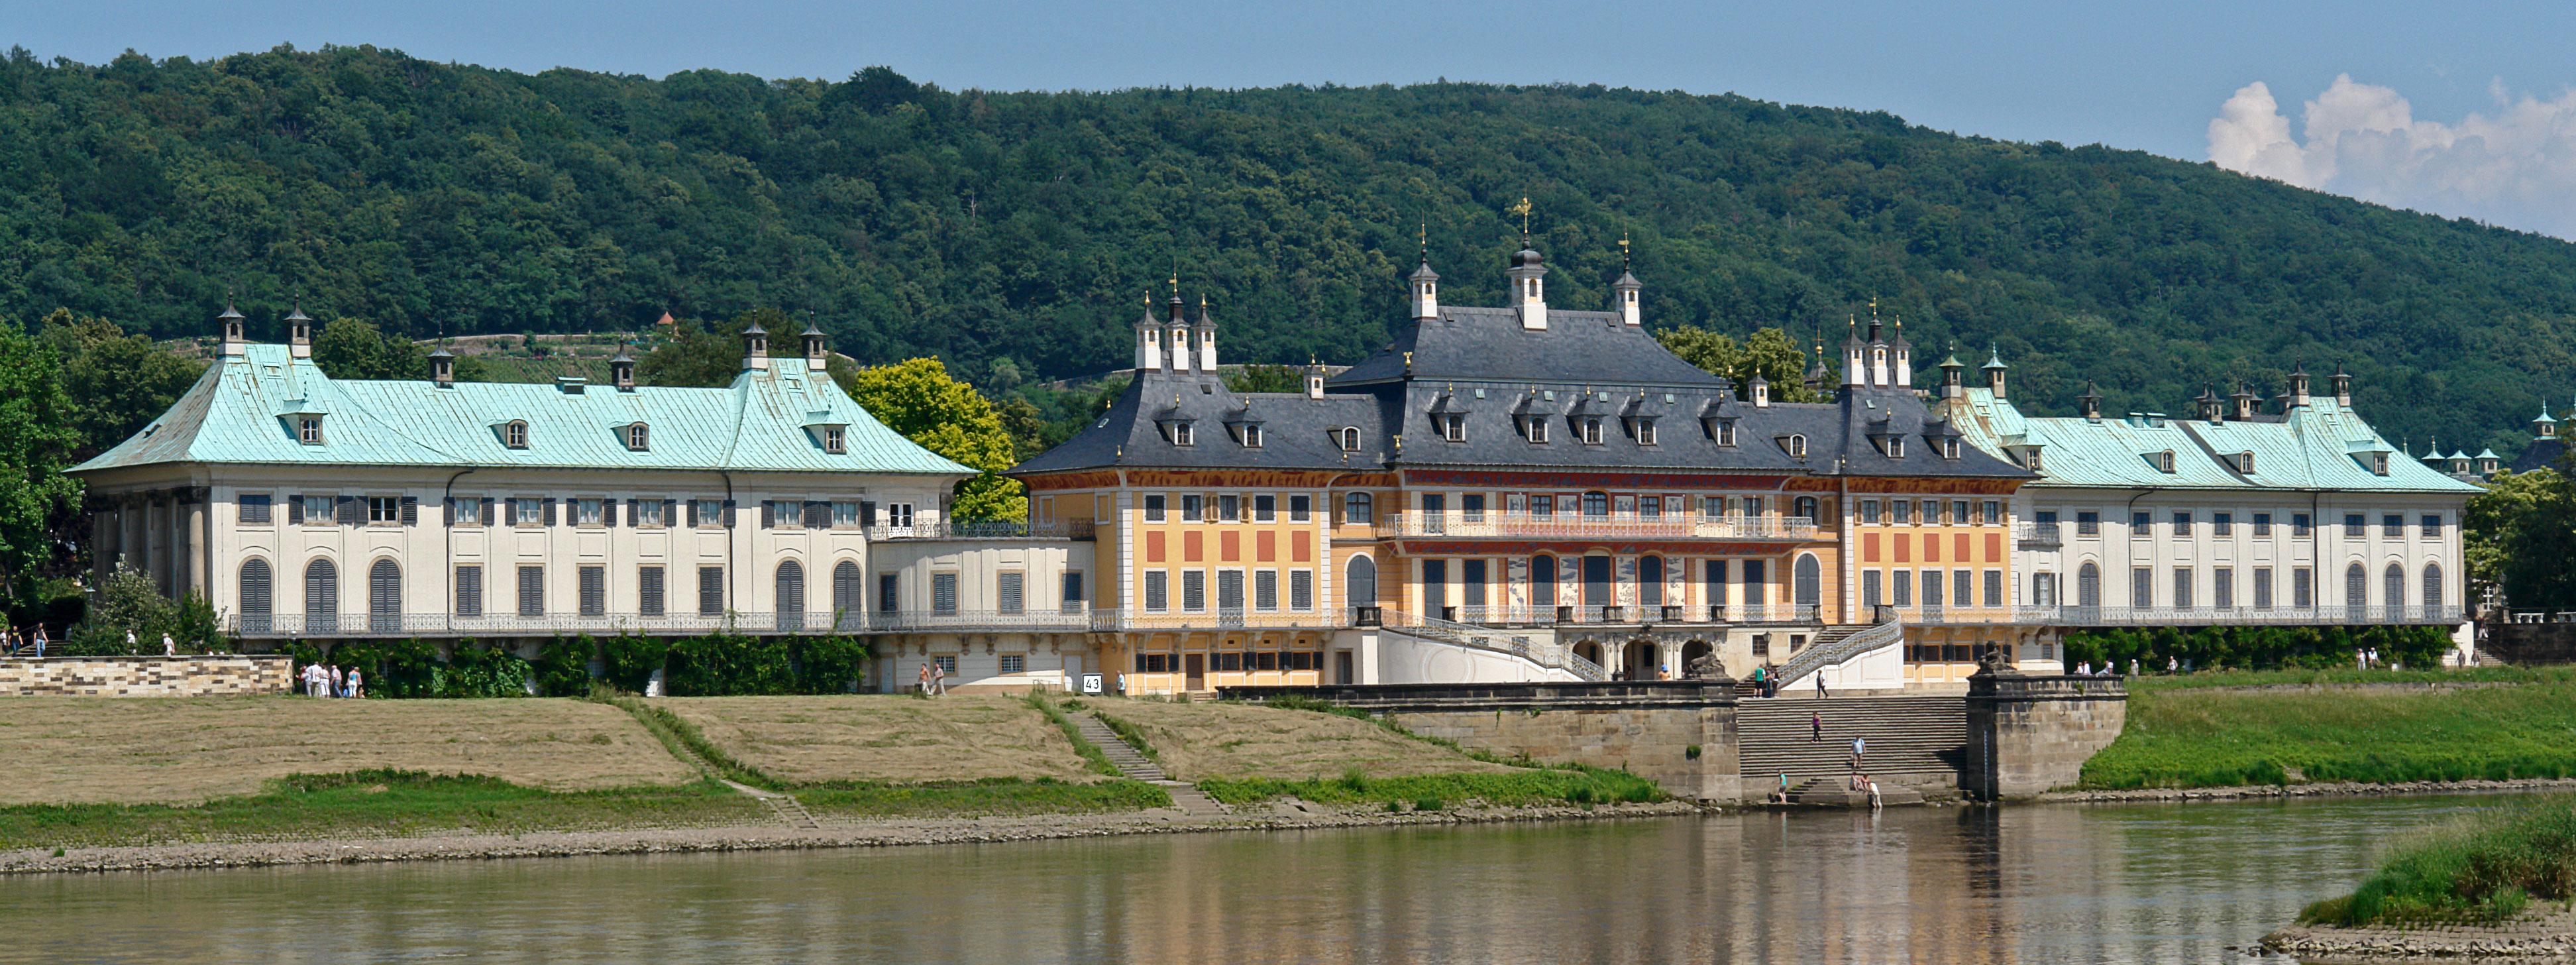 Pillnitz Castle Wikipedia